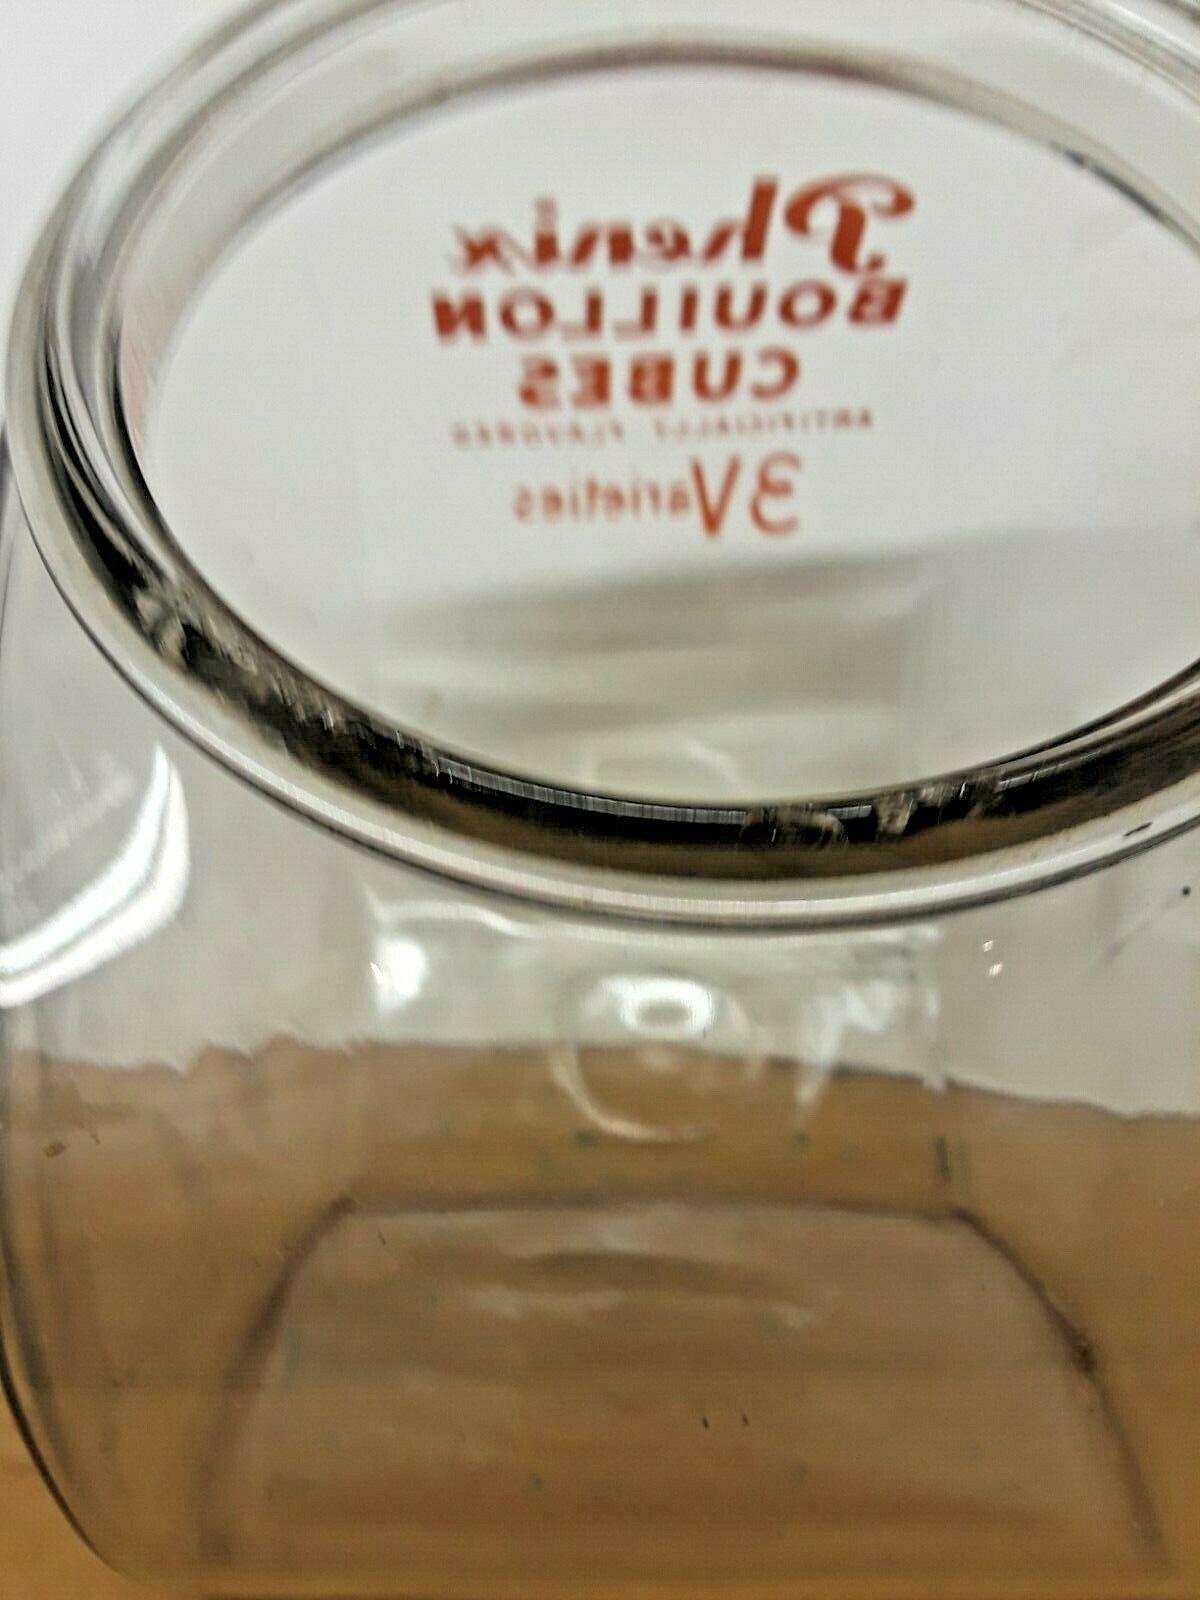 Vintage Phenix Bouillon Cubes Glass Countertop Jar Display Anchor Hocking USA